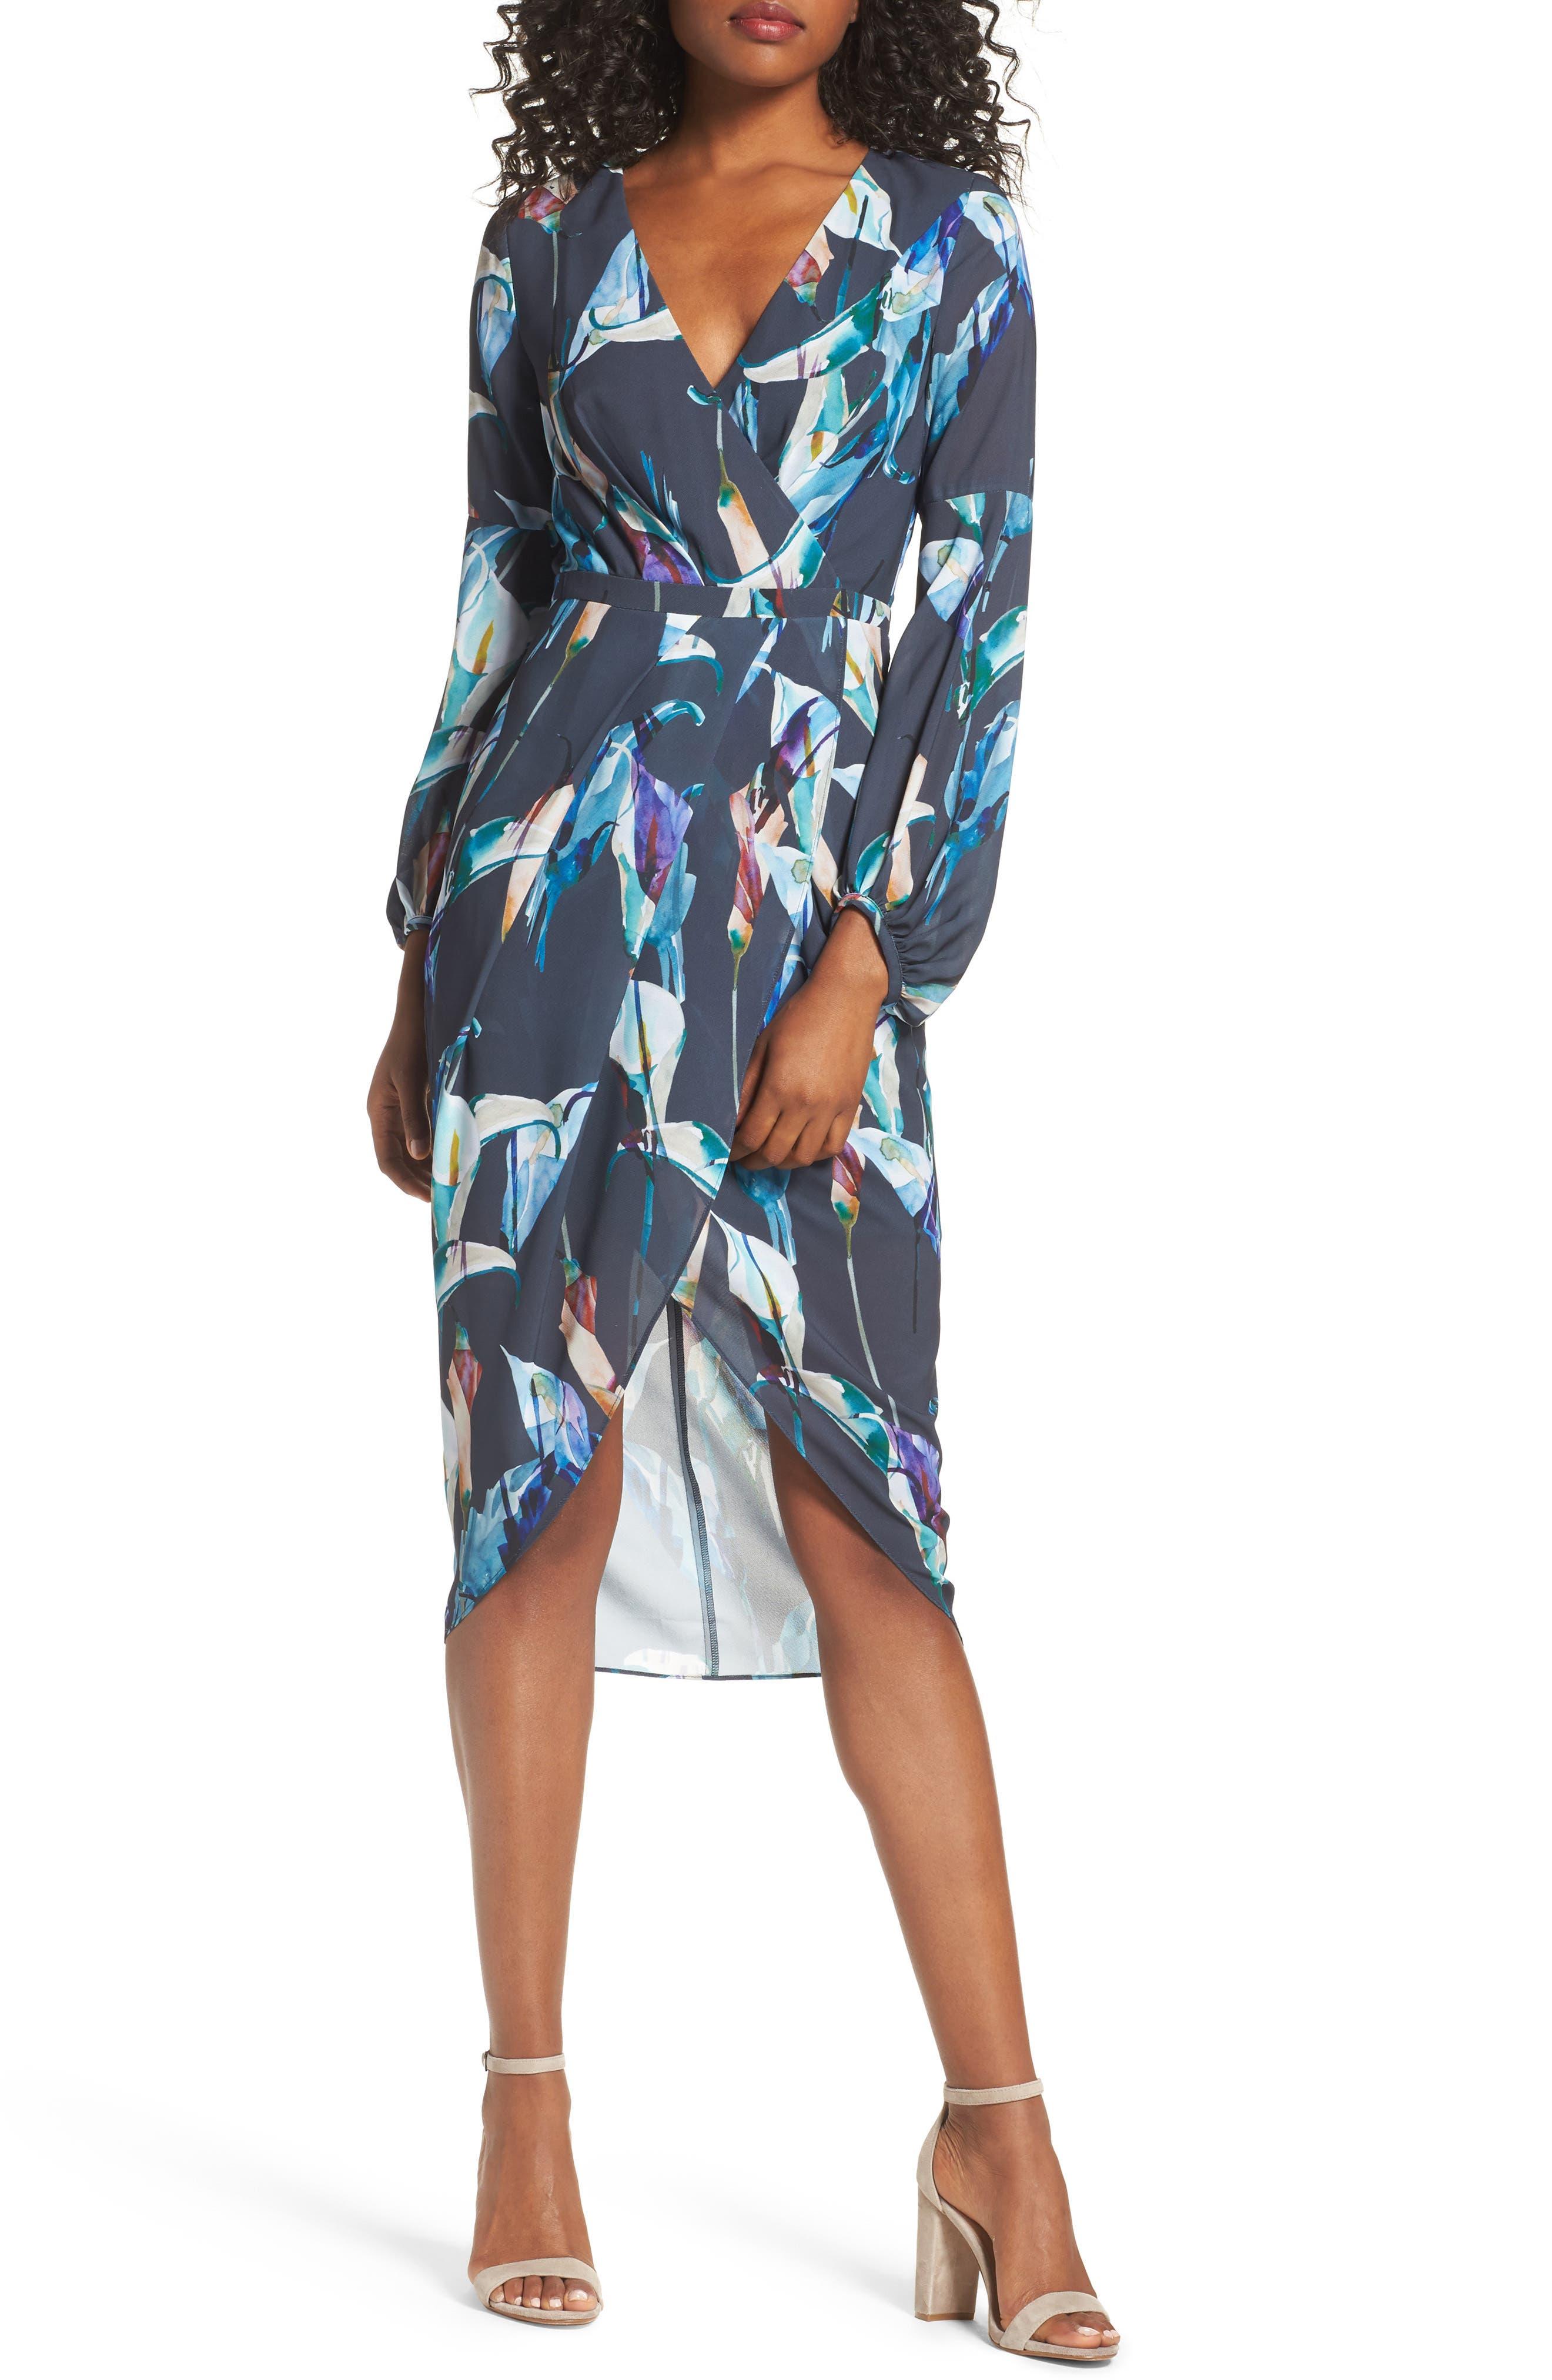 Romanticise Midi Dress,                             Main thumbnail 1, color,                             Black/ Aqua